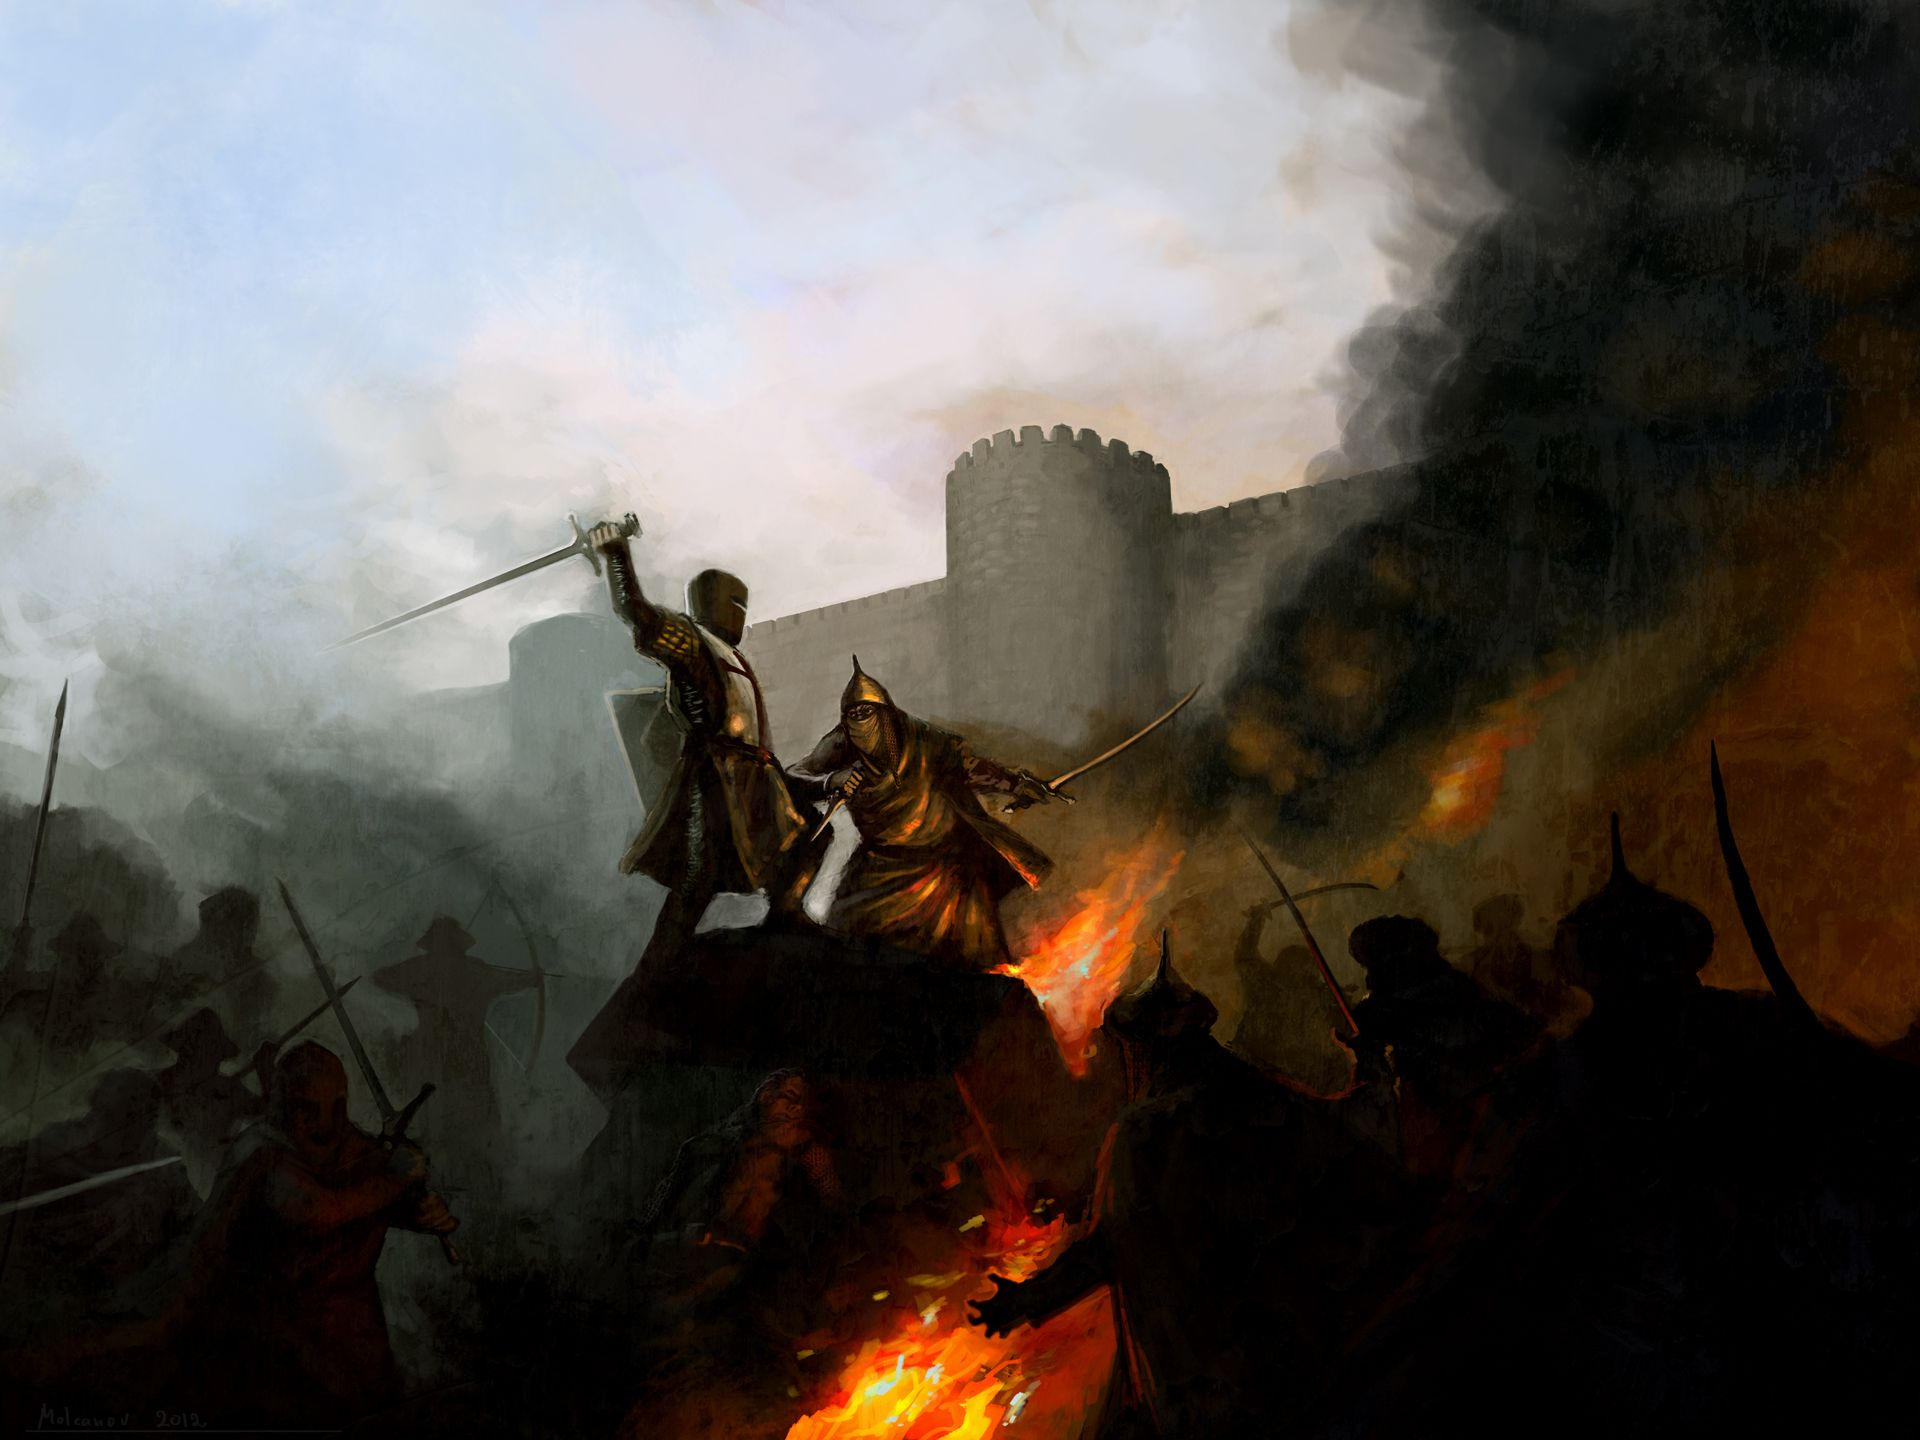 Pin By Mark Beerdom On Crusaders War Art Crusader Wallpaper Crusader Kings 2 Crusades